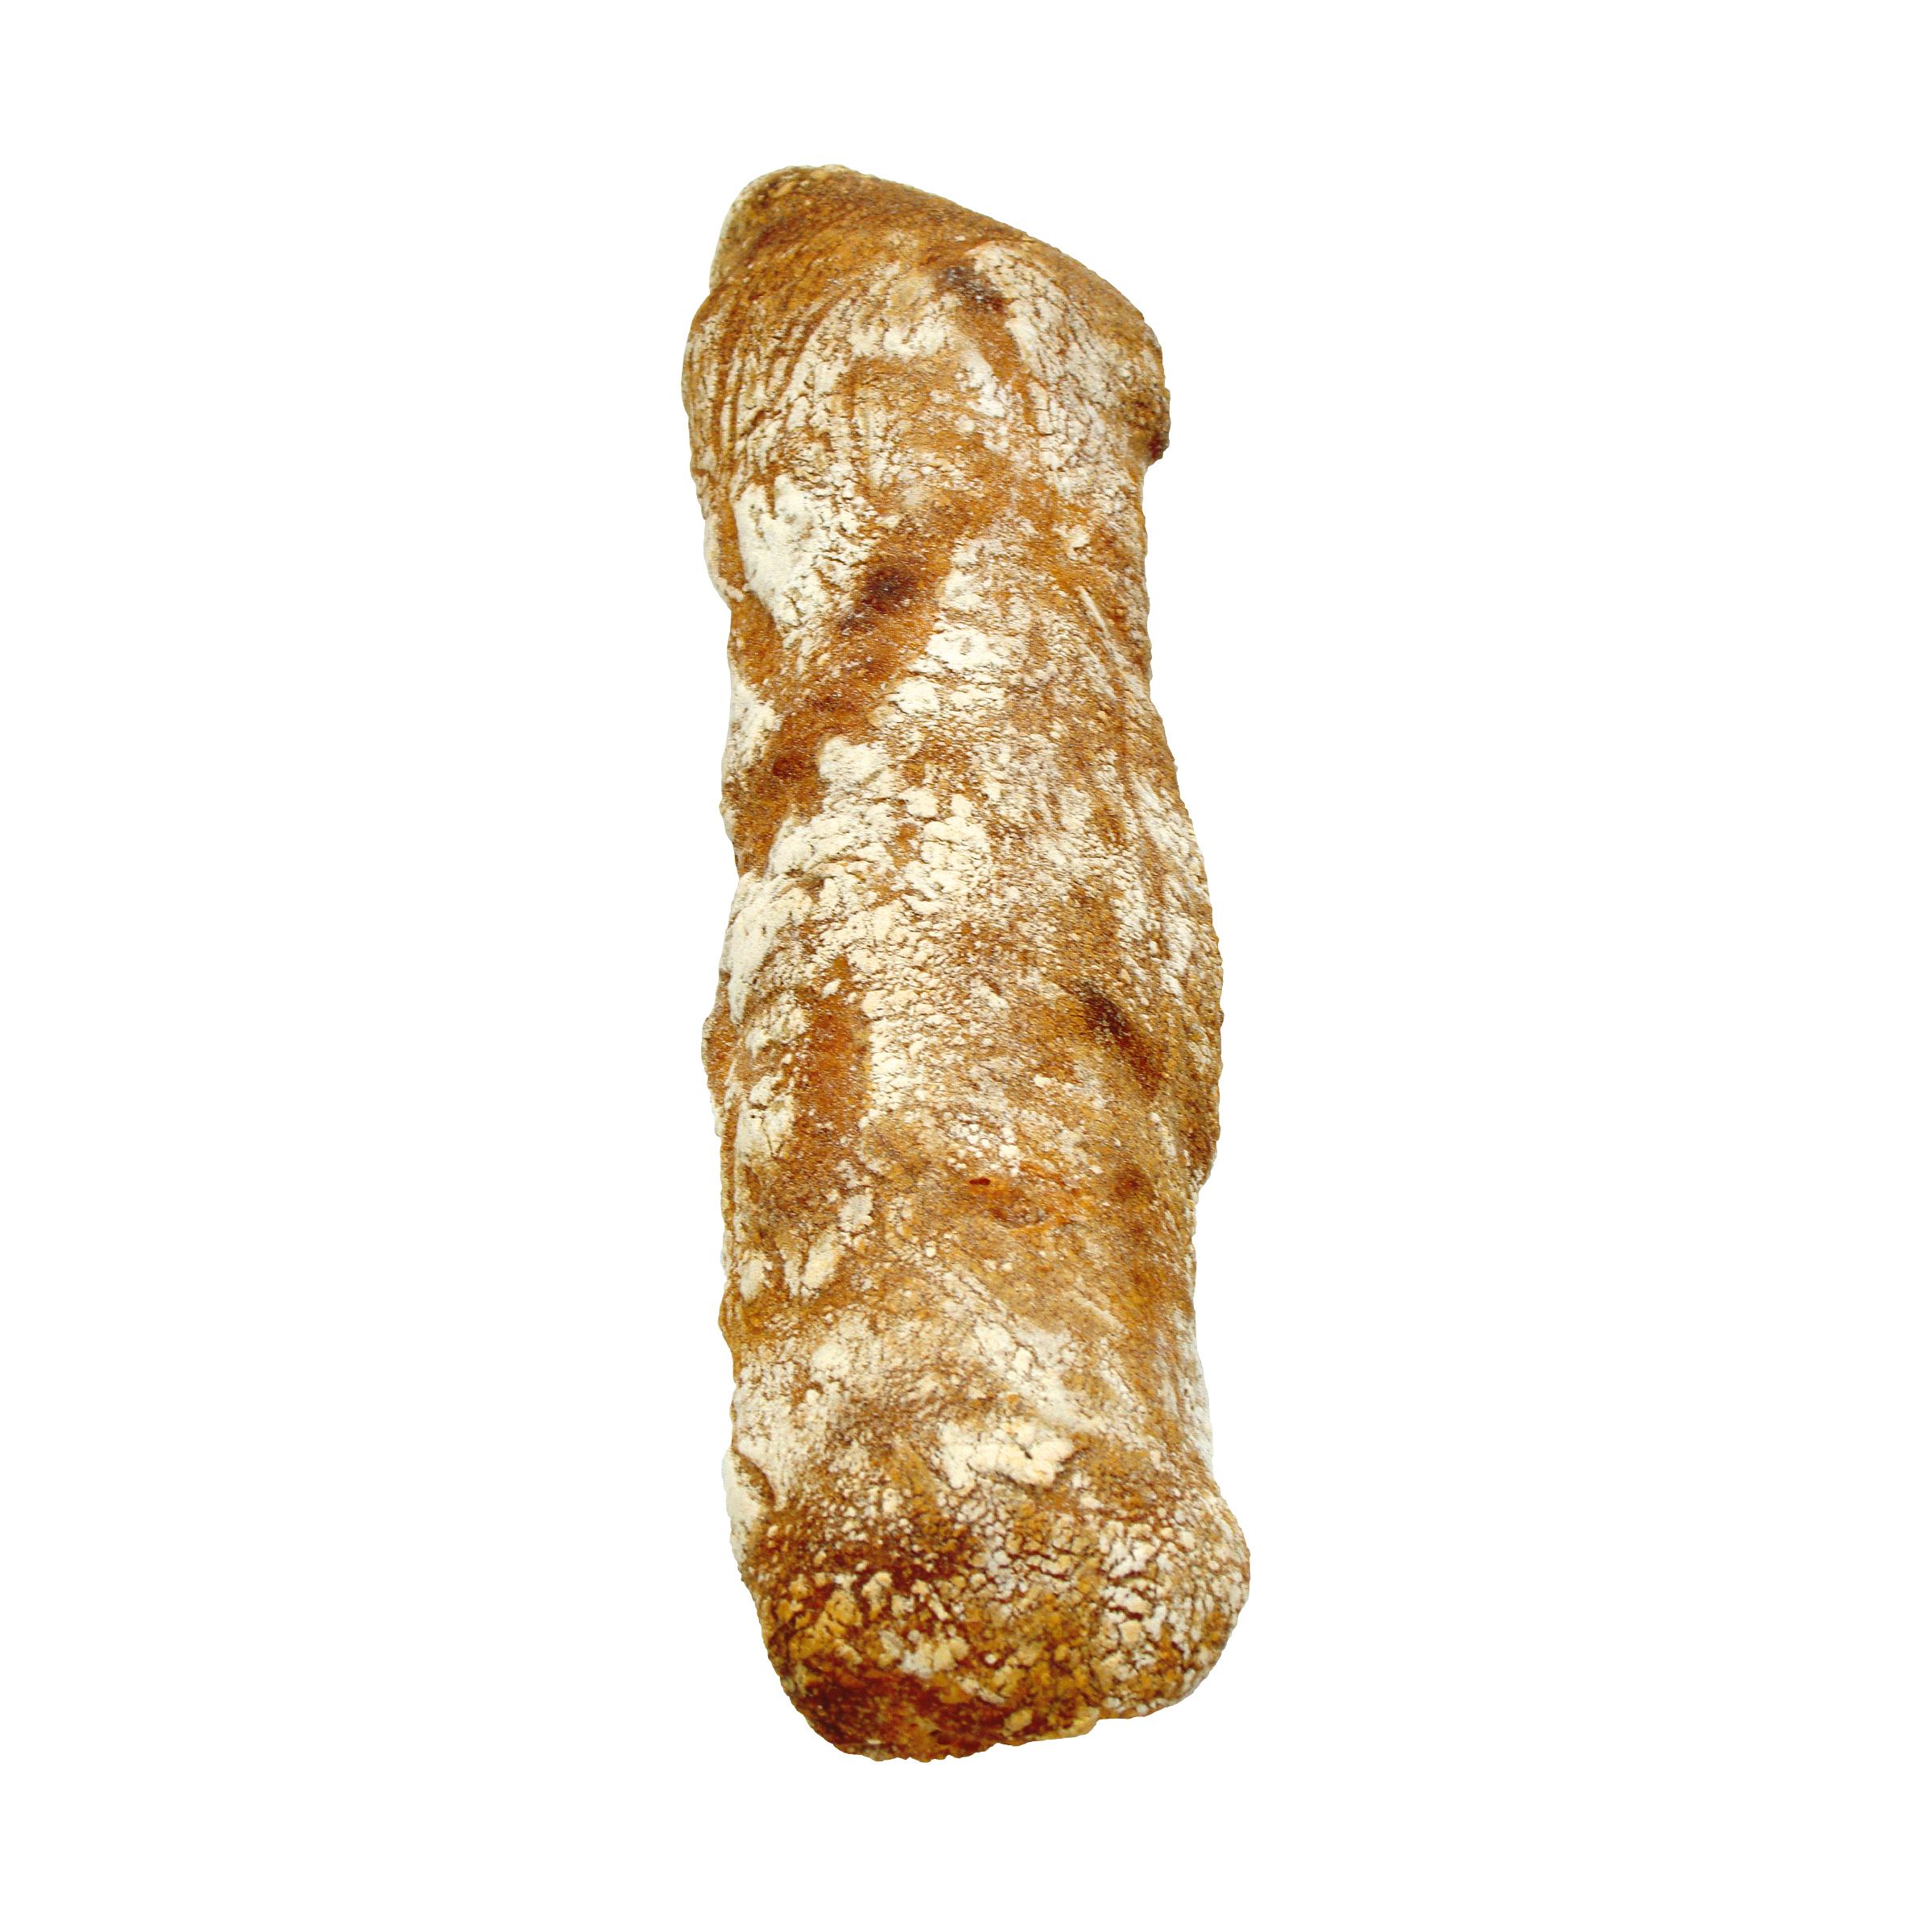 Bauern Baguette Dinkelbrote Brote Brote & Aufstriche